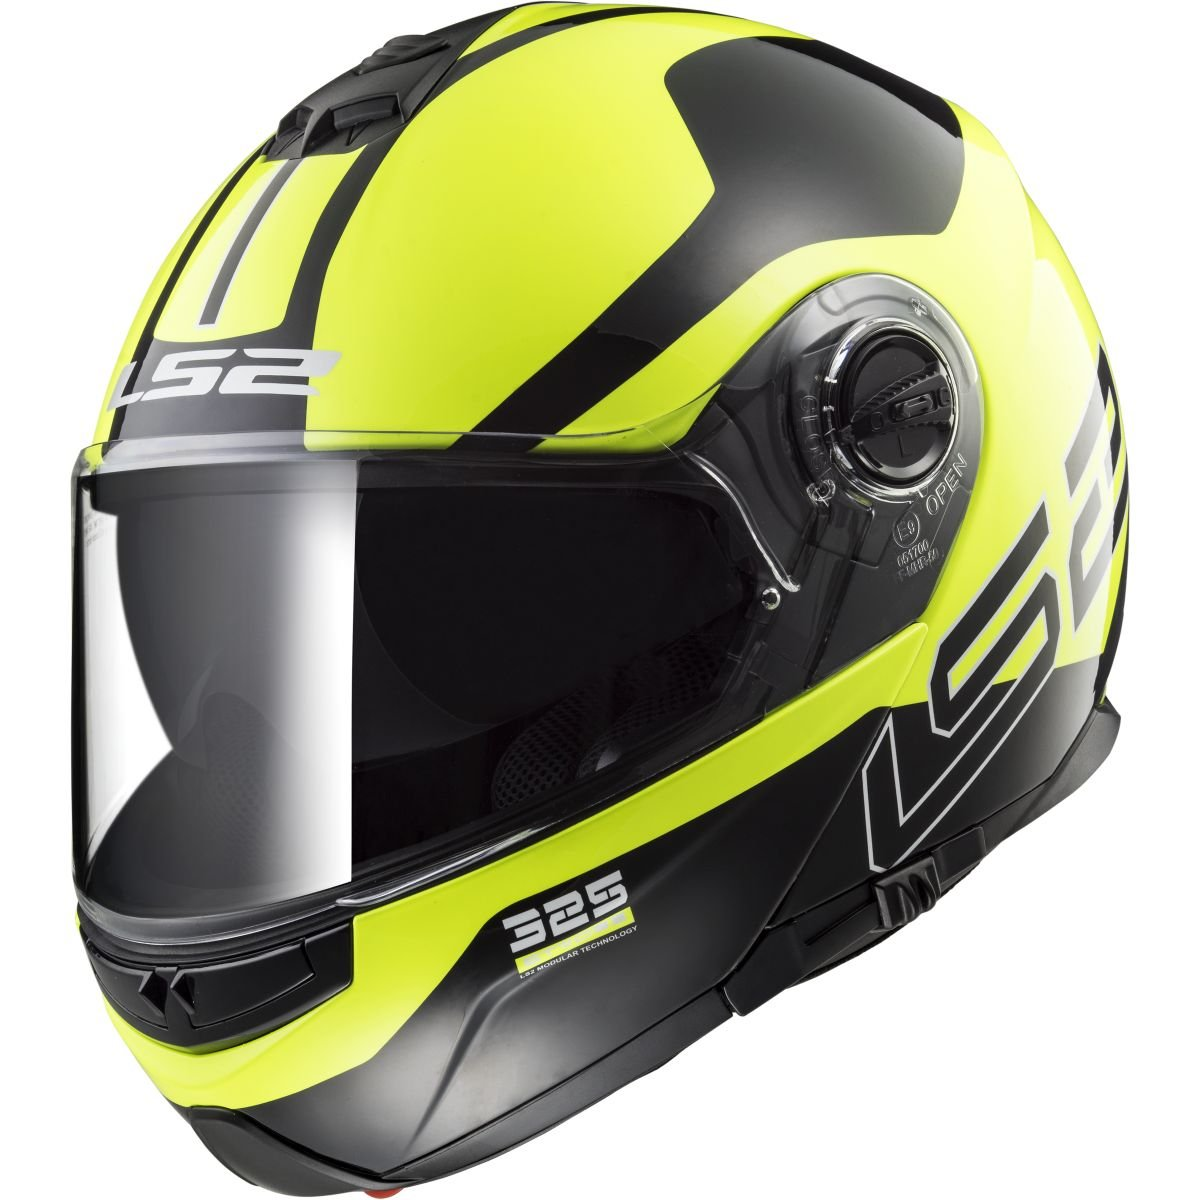 Gunmetal, XX-Large LS2 Helmets Strobe Solid Modular Motorcycle Helmet with Sunshield